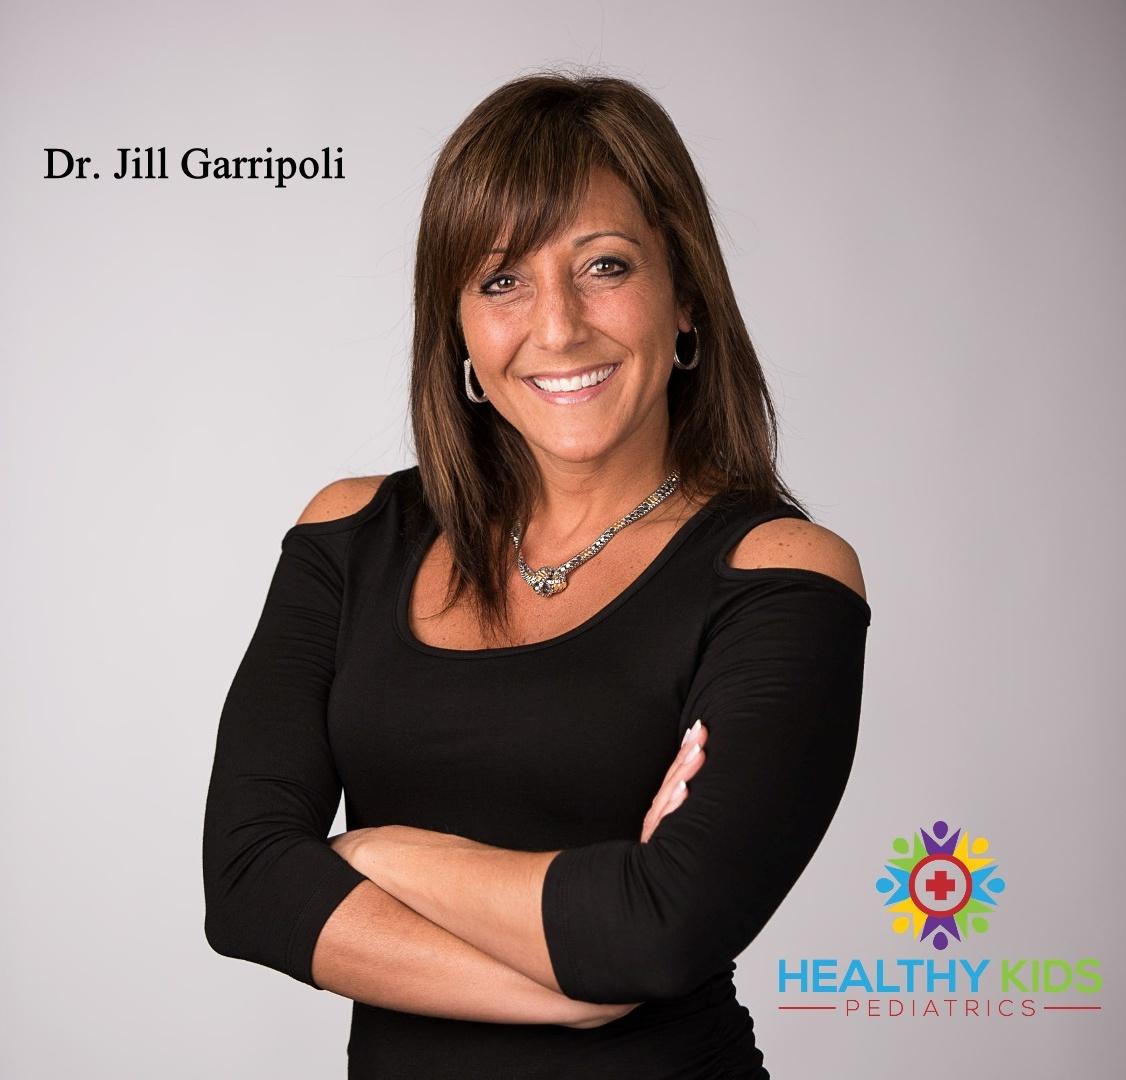 Dr. Jill Garripoli, (Branded)  Owner of Healthy Kids Pediatrics in Nutley NJ.jpg